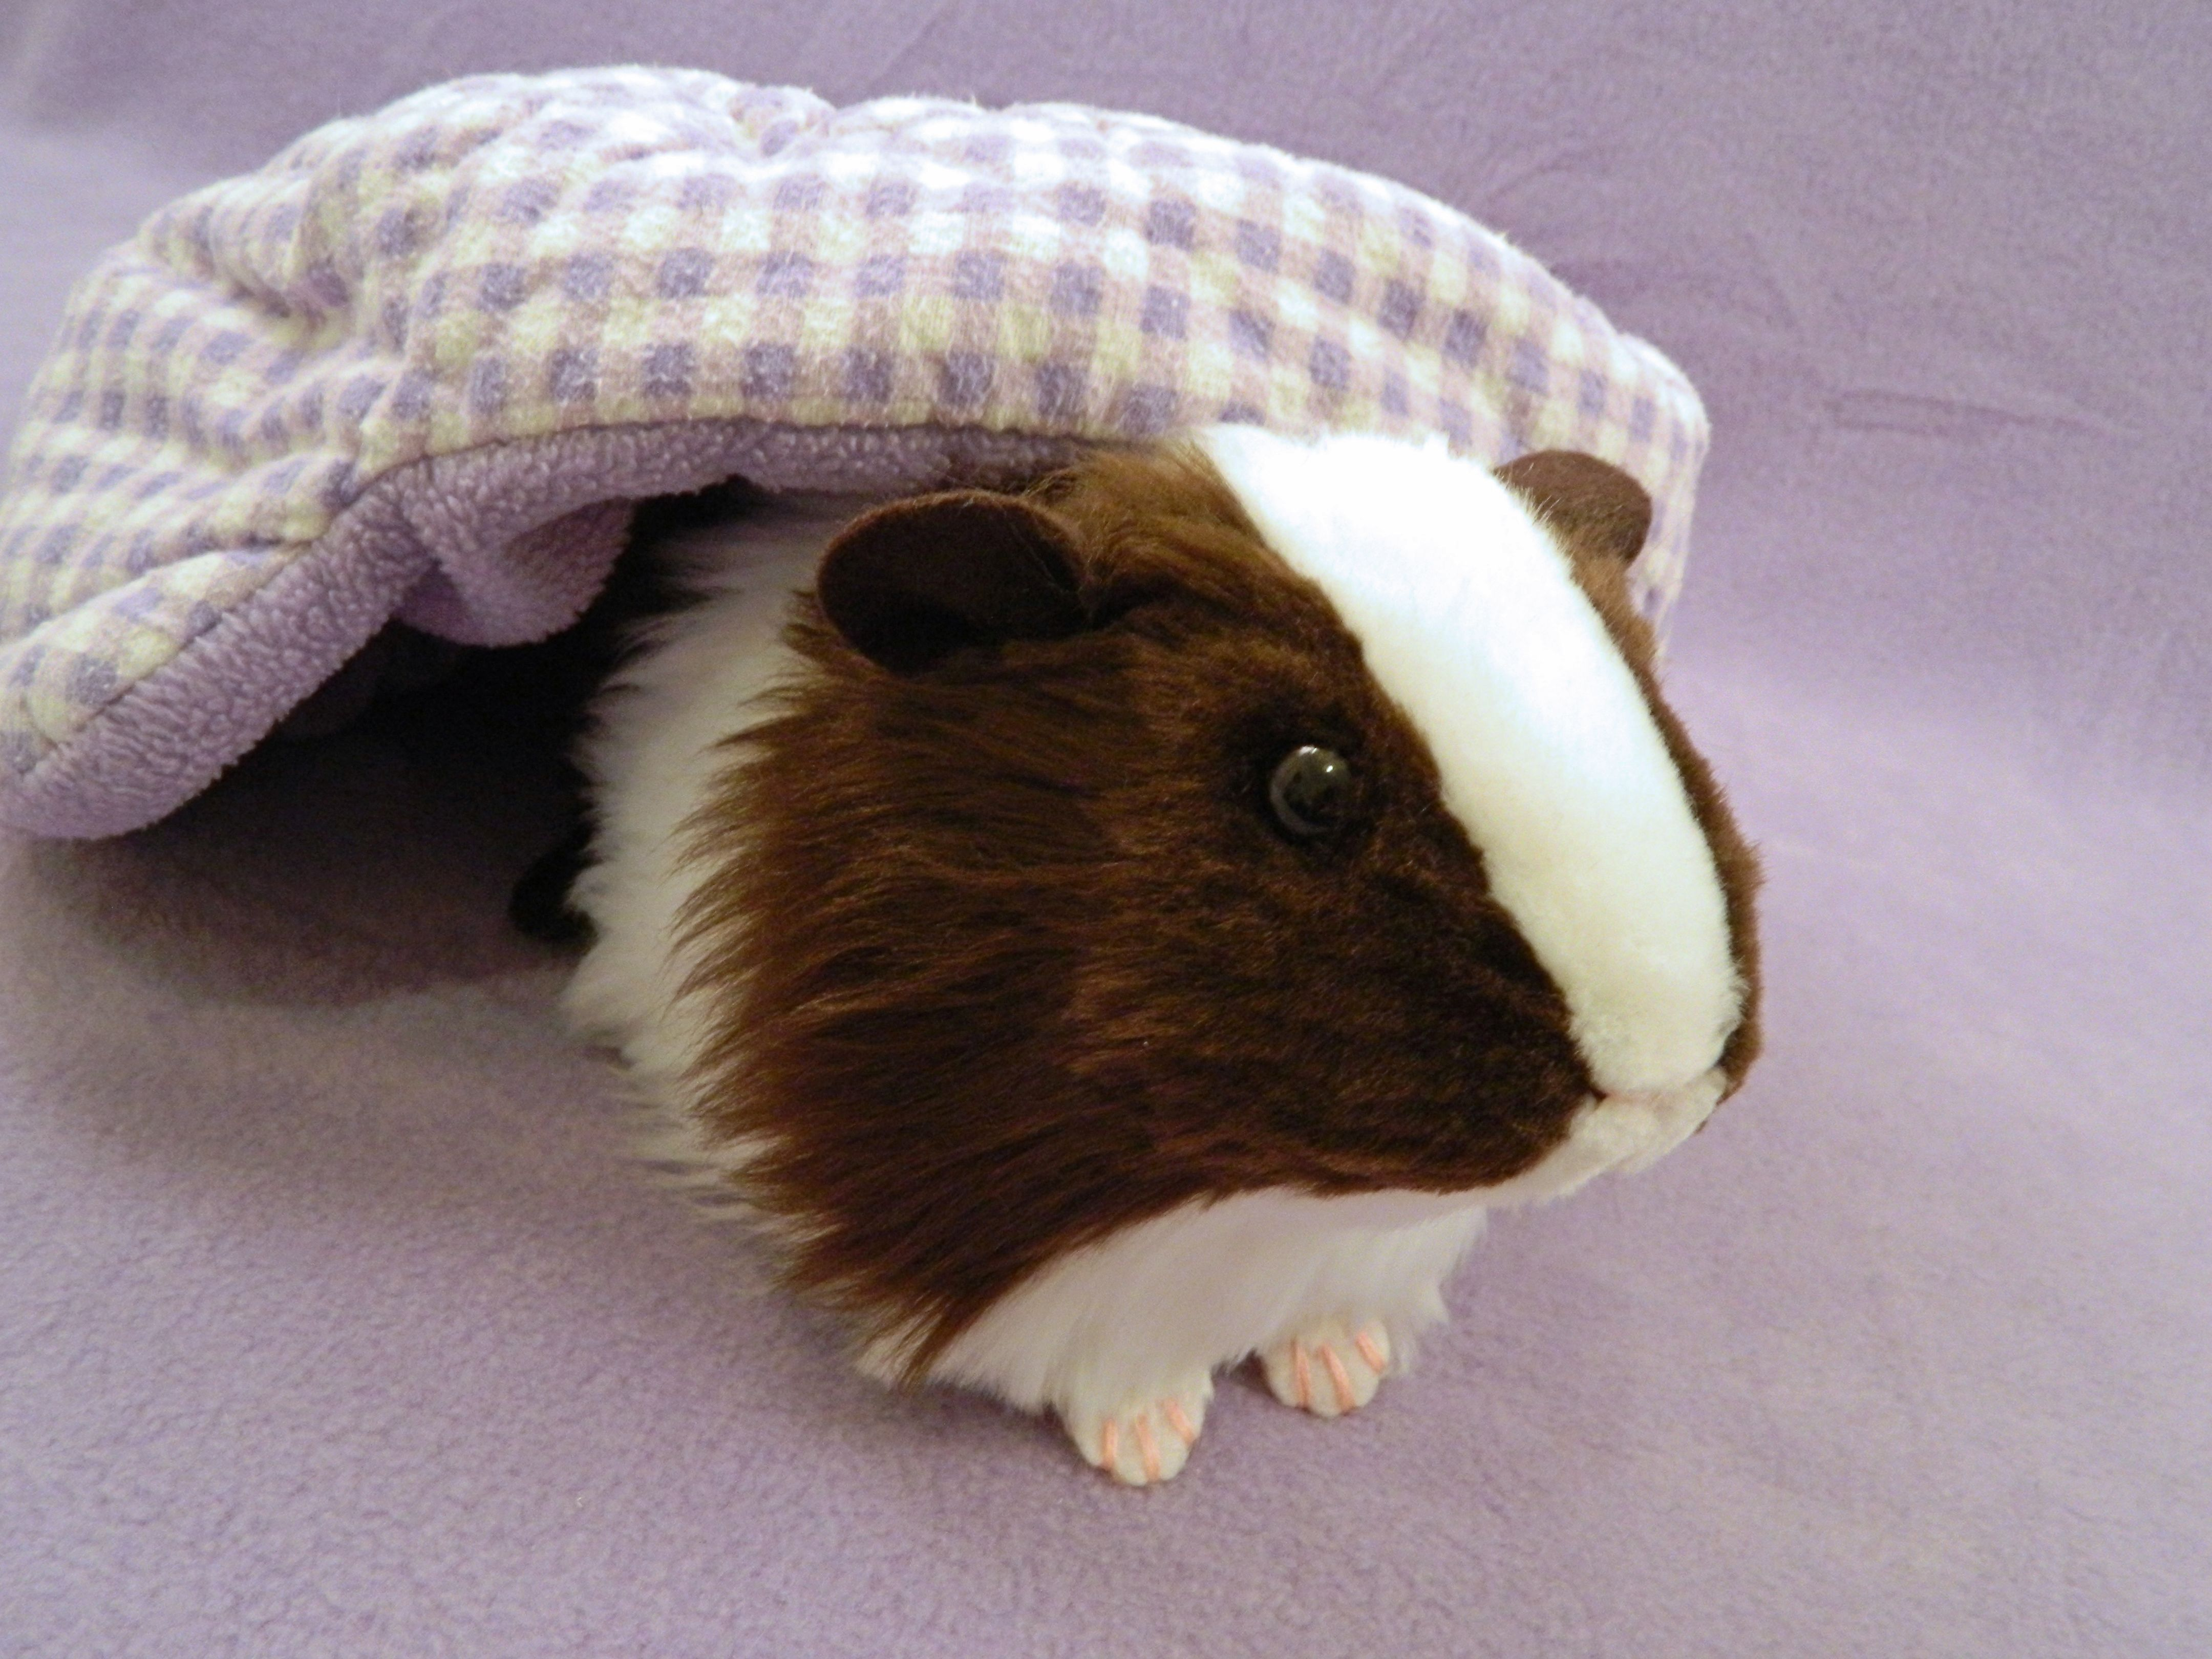 7 Inch Lovely Brown /& Black Guineapig//Guinea Pig Soft Plush Toys Guinea Pig